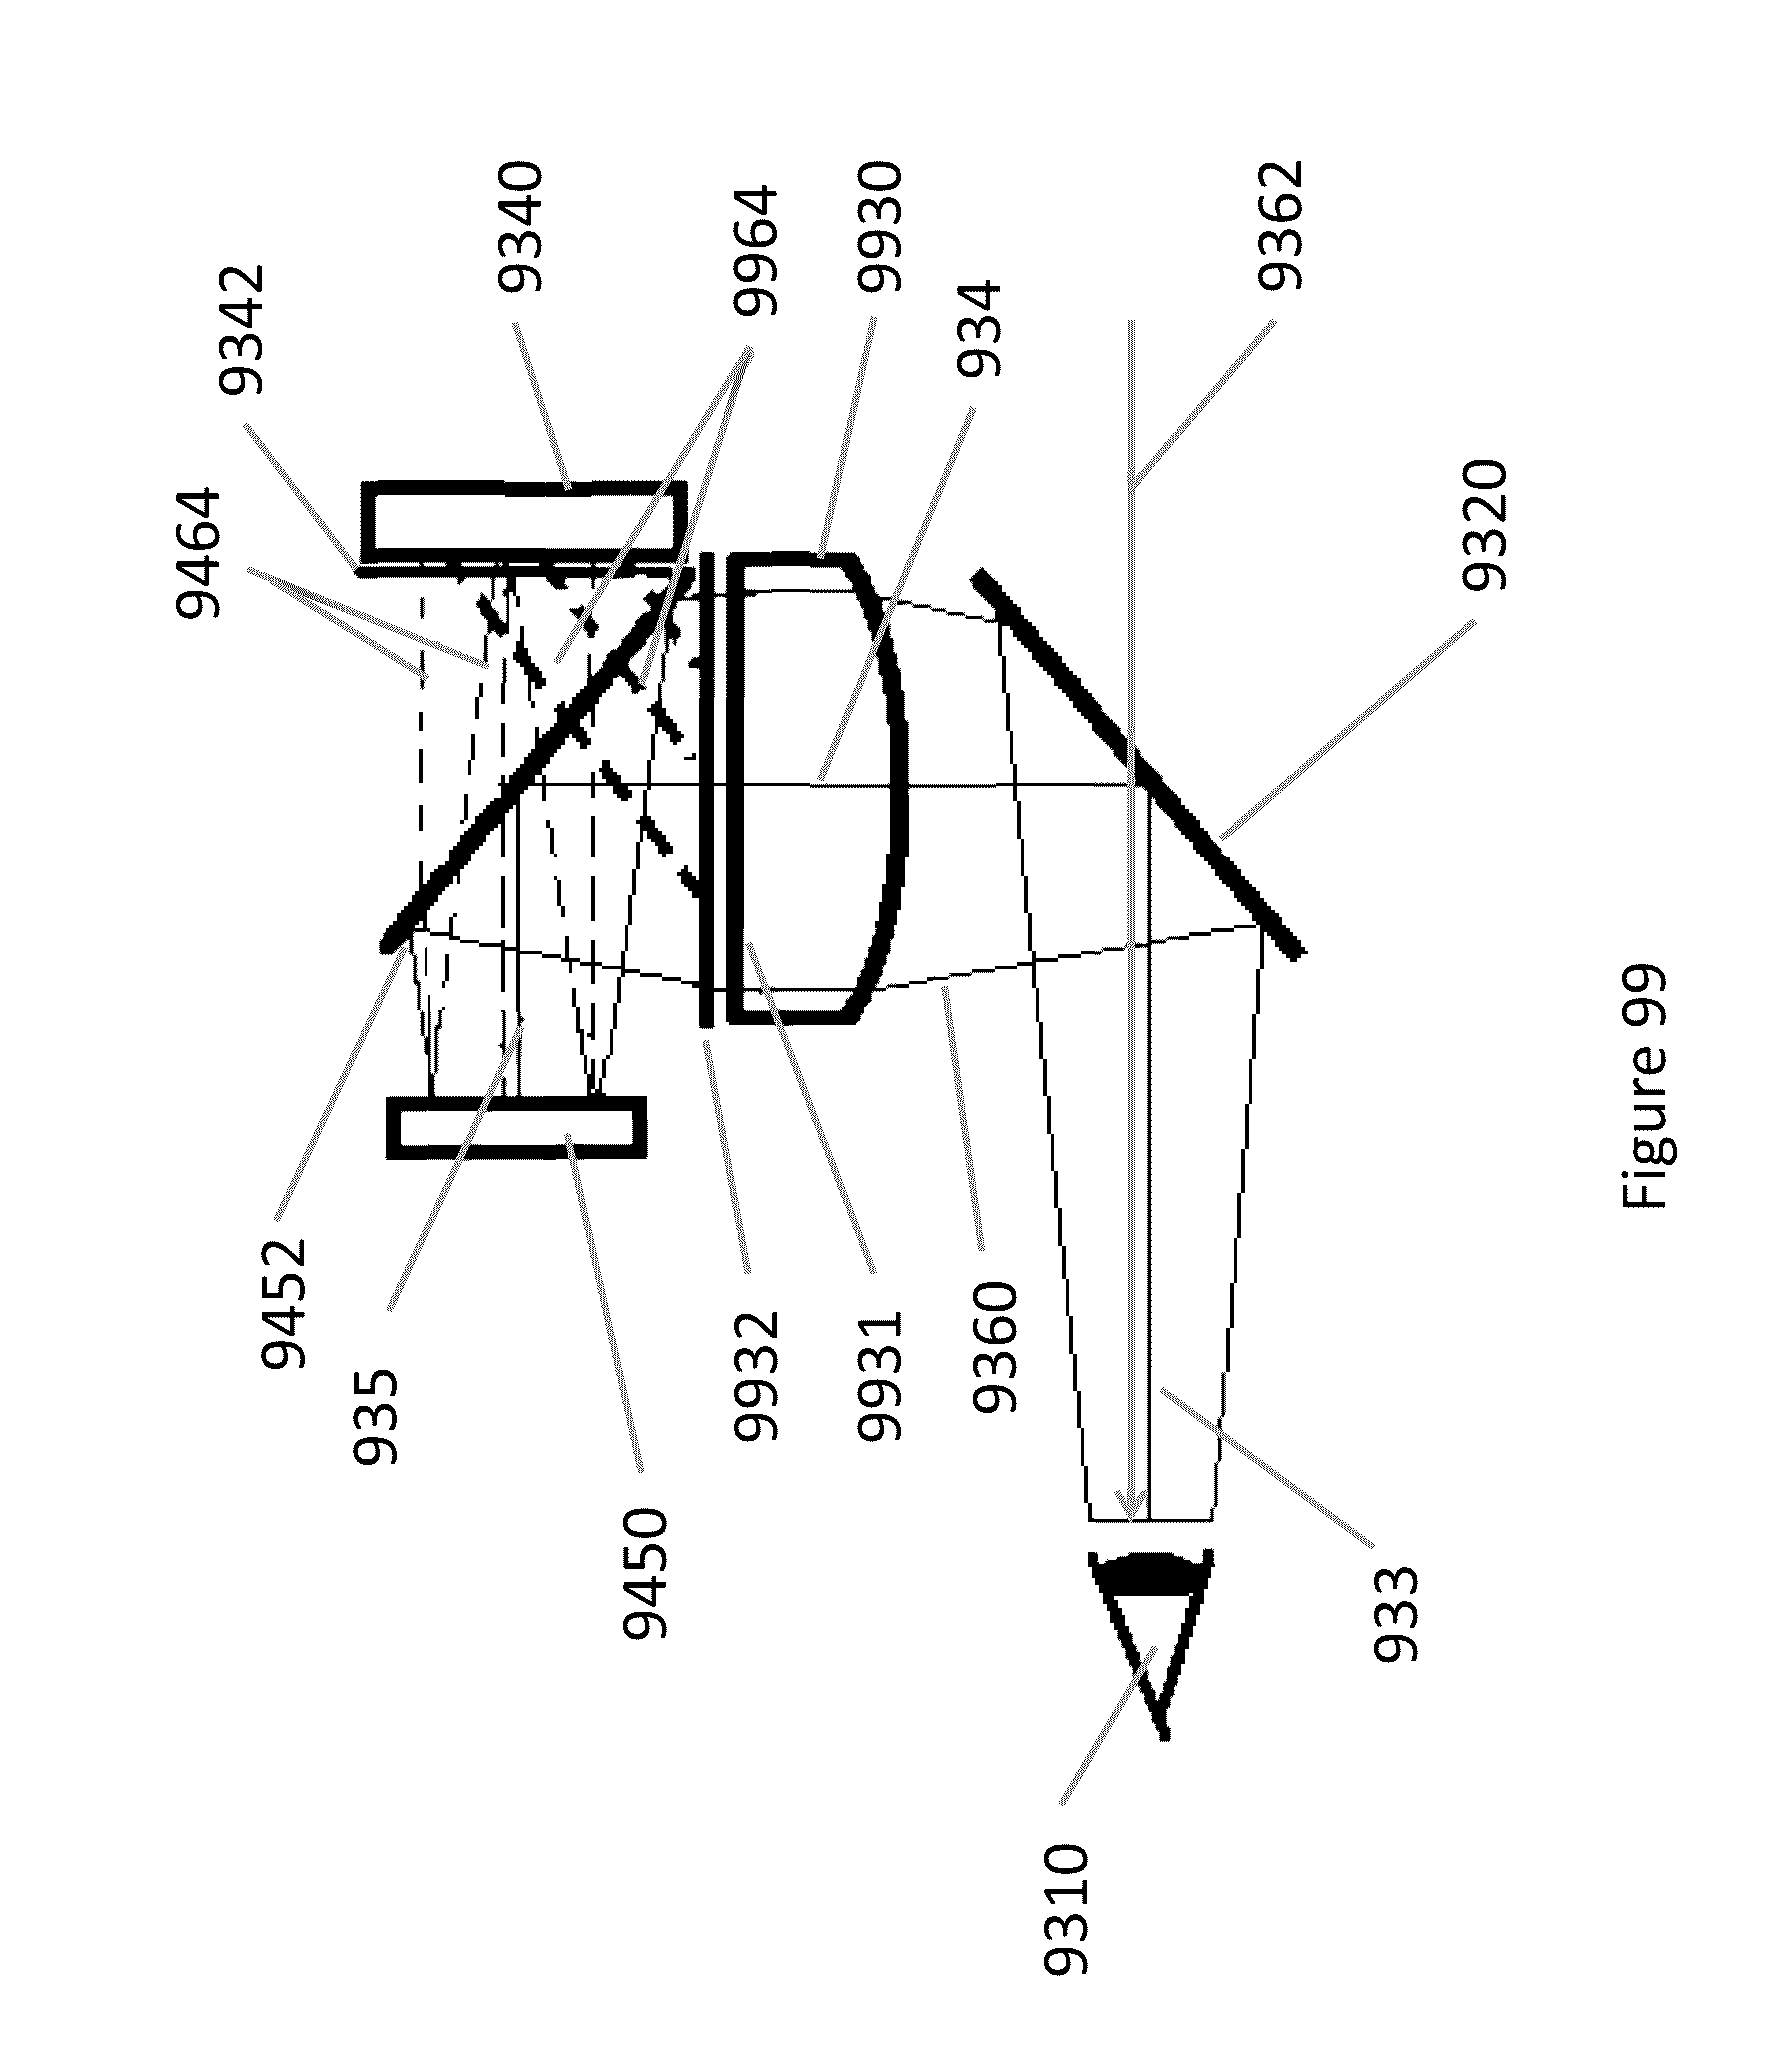 patent us 9 658 457 b2 Pre-Action Sprinkler System Design patent images